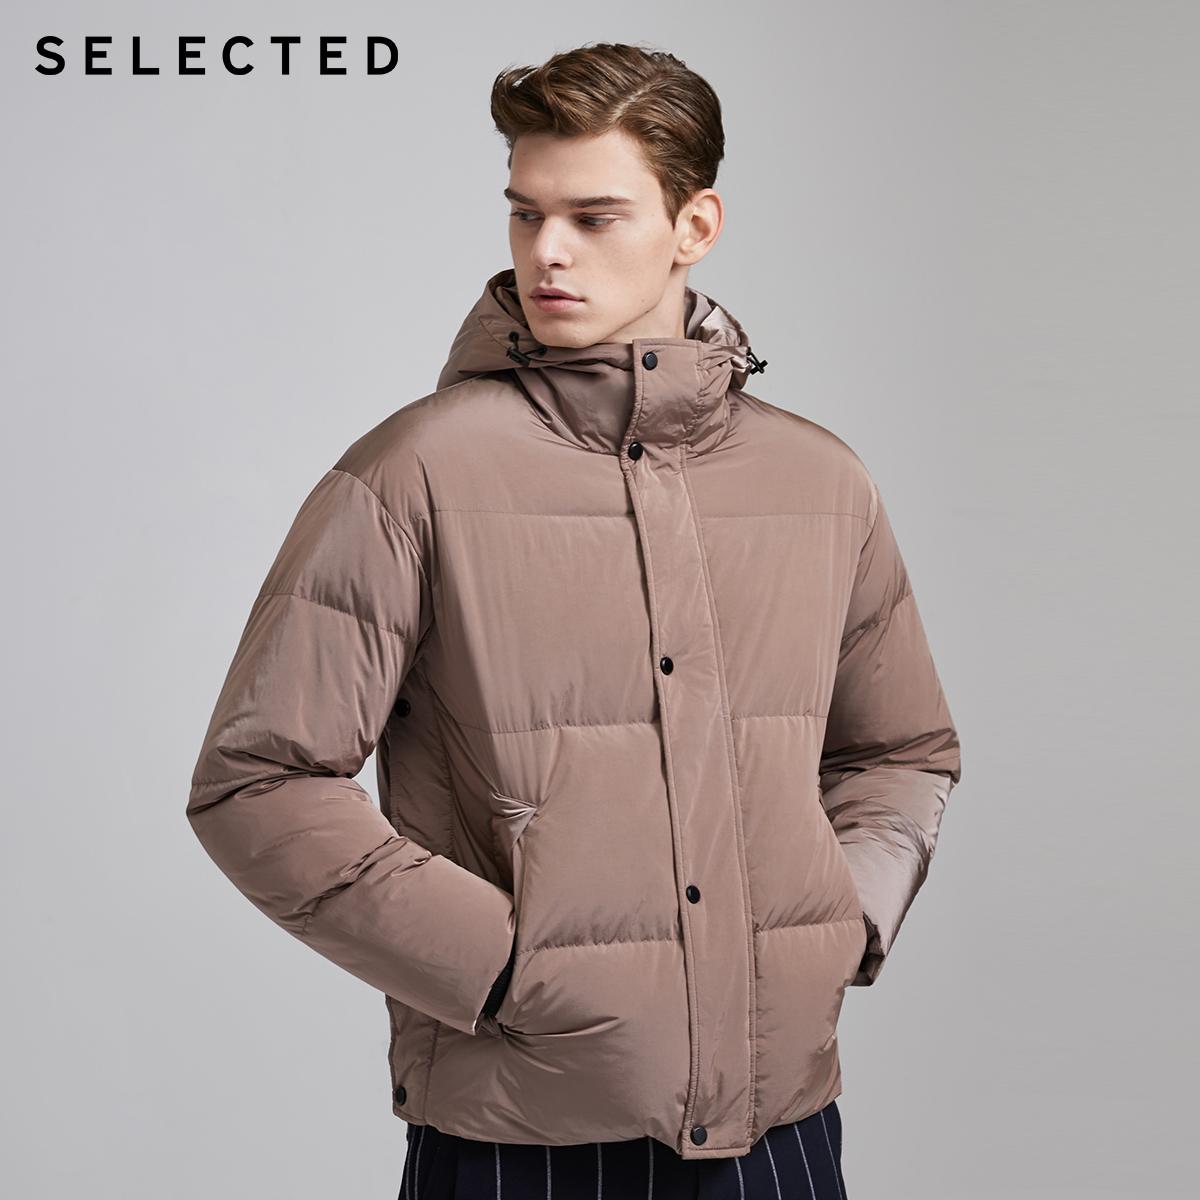 SELECTED 思莱德 男式加厚短款连帽羽绒服外套 双重优惠折后¥199.5包邮 2色可选